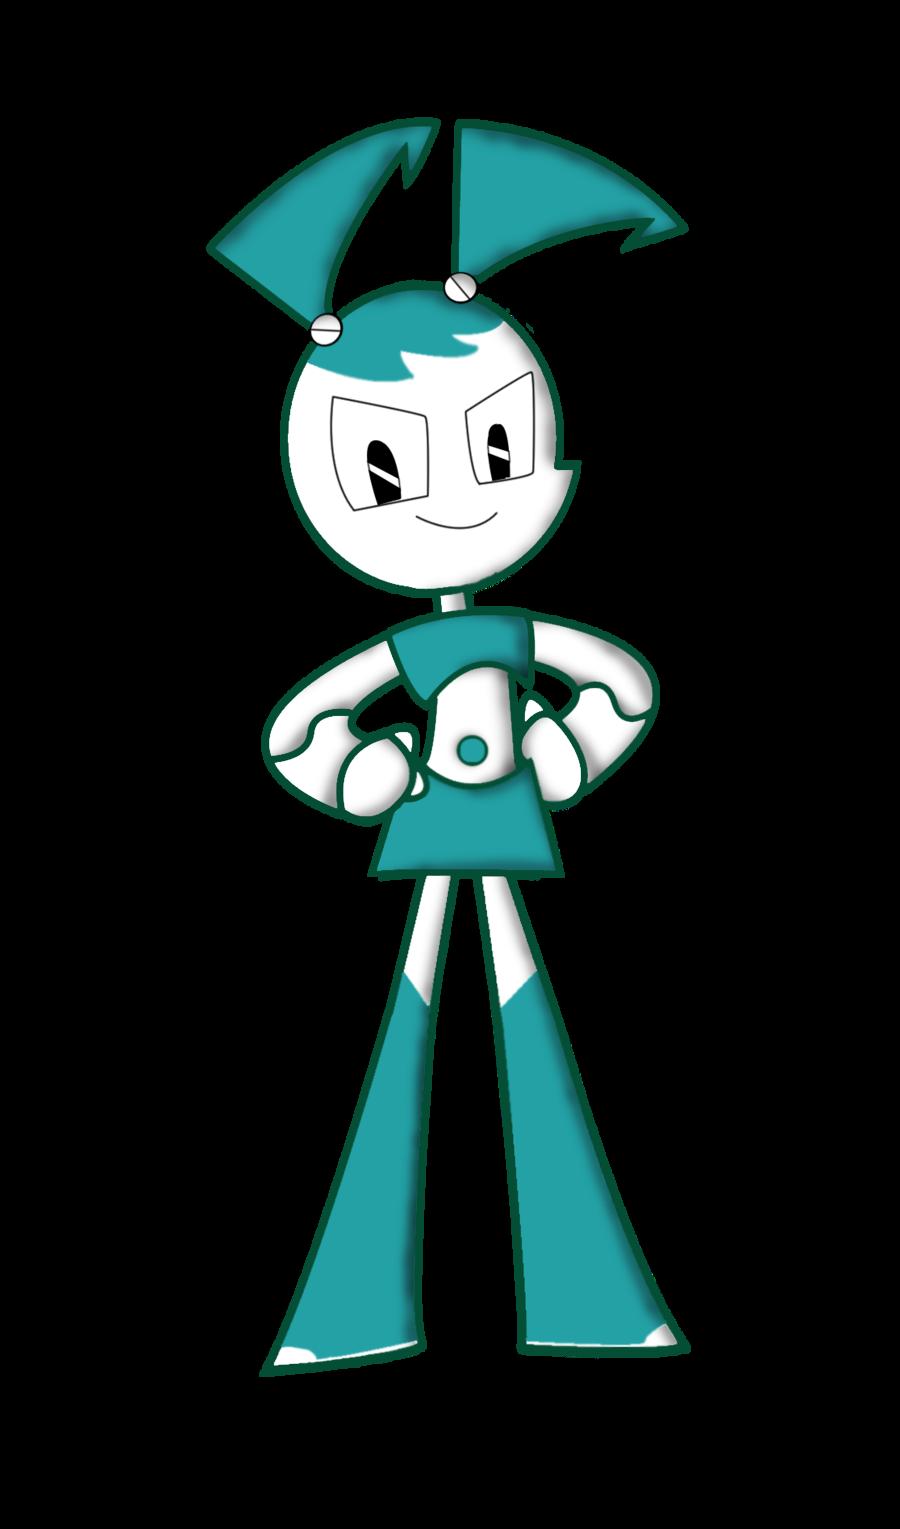 Jenny wakeman xj dbx. Clipart doctor robot